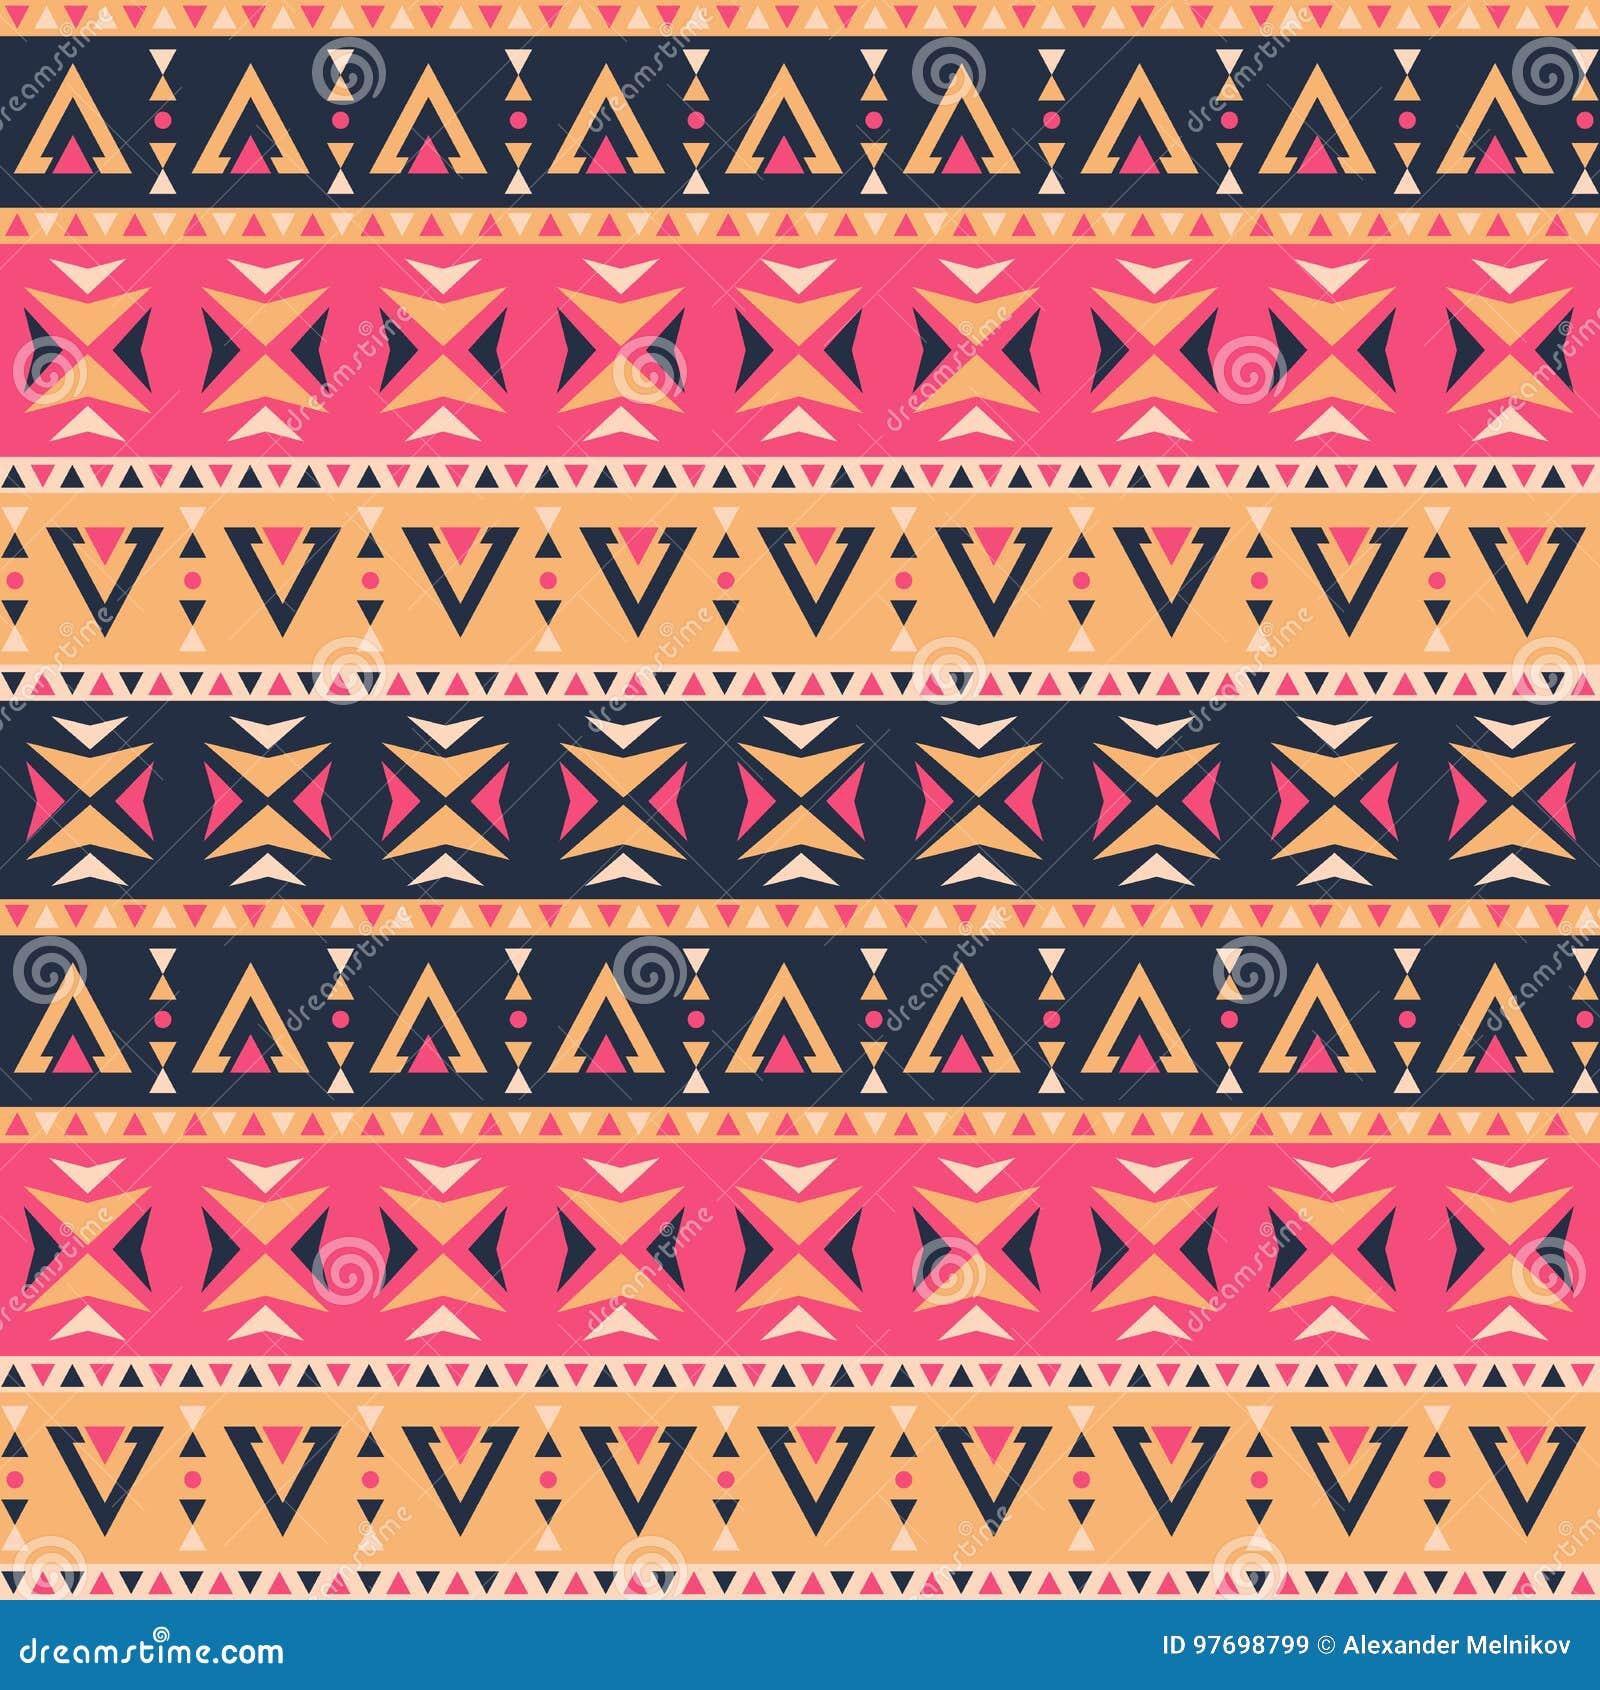 Decorative Patterns New Decorating Design